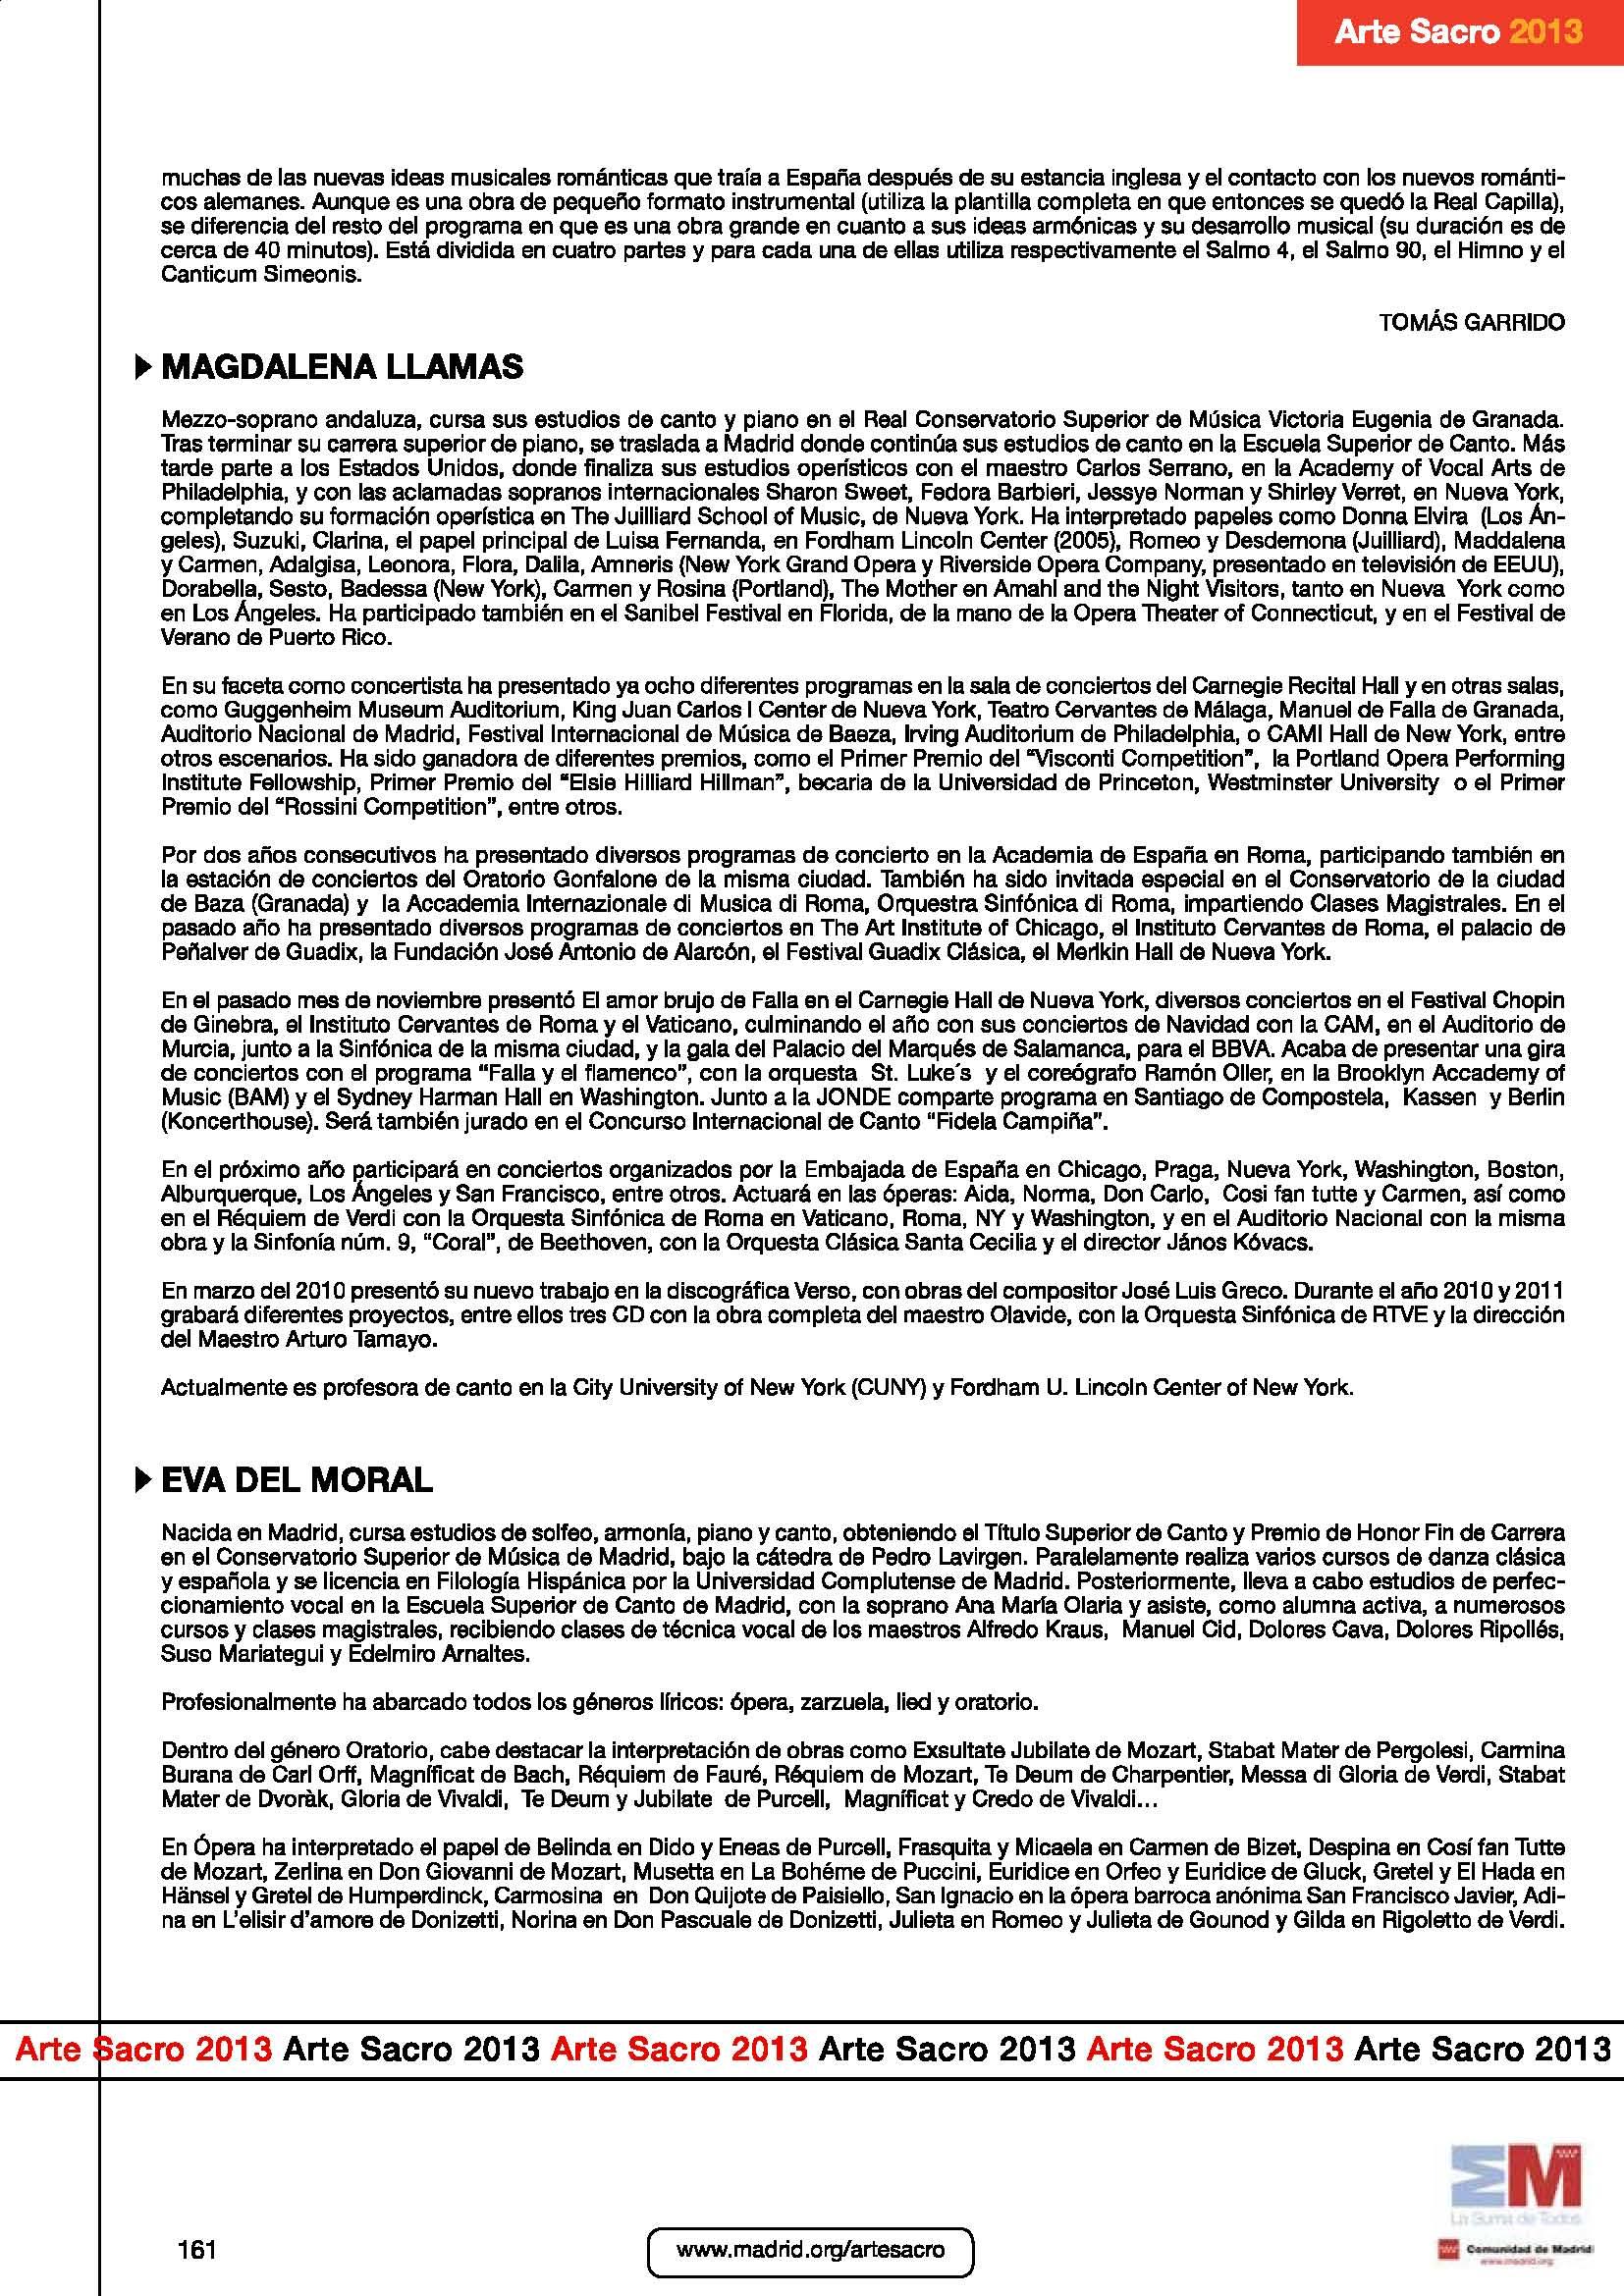 dossier_completo_Página_161